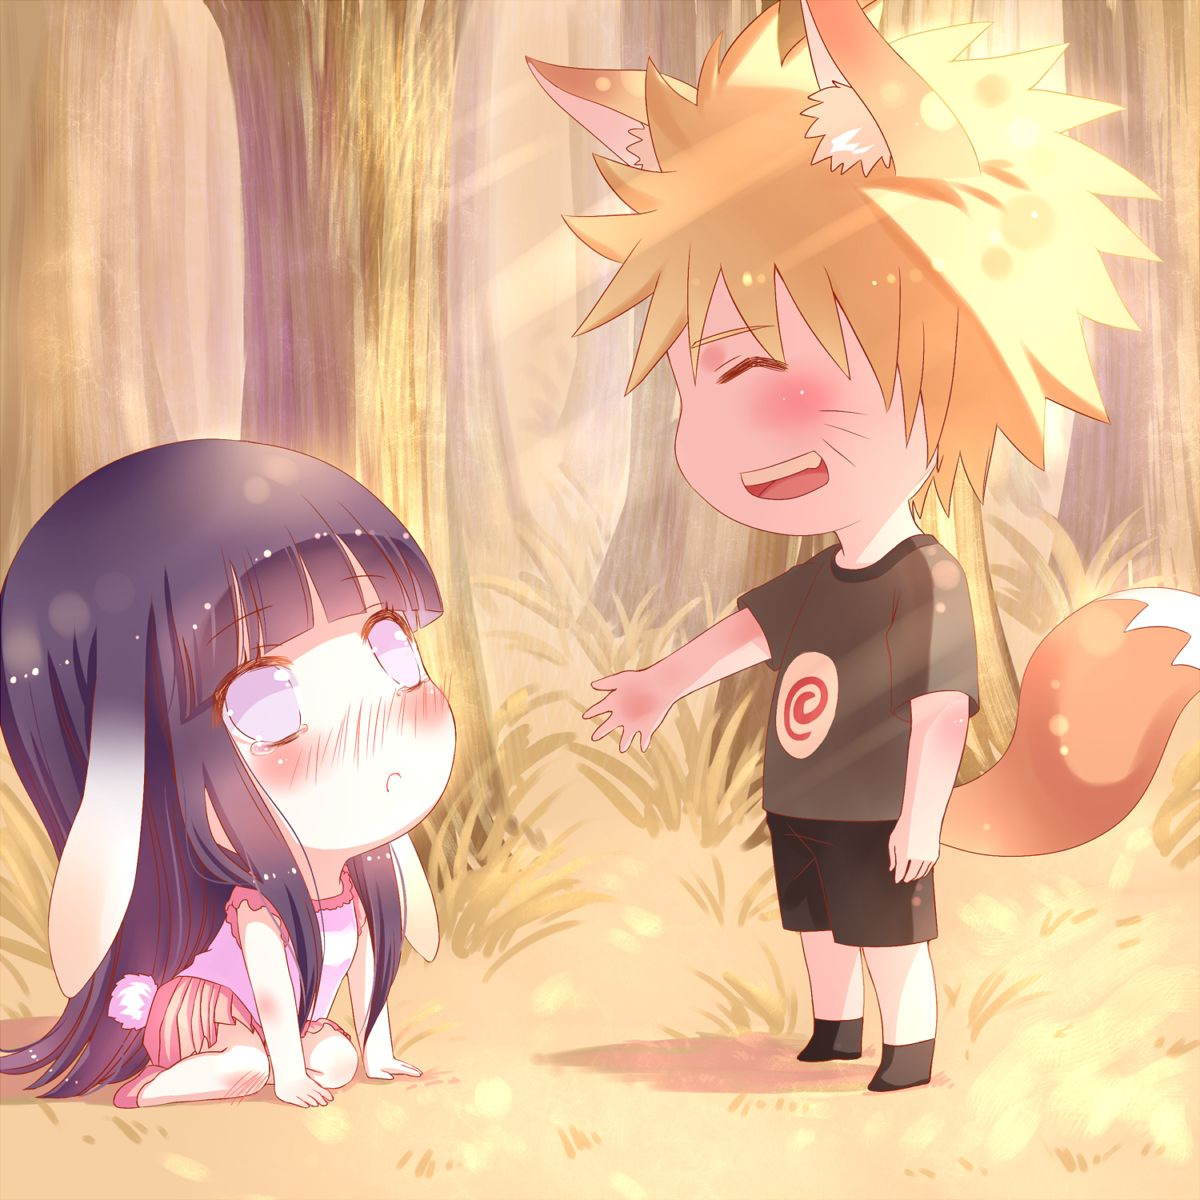 Must see Wallpaper Naruto Couple - 3dae3f34190eb14a94b6d4bd95ed2bbf  Image_52448.jpg